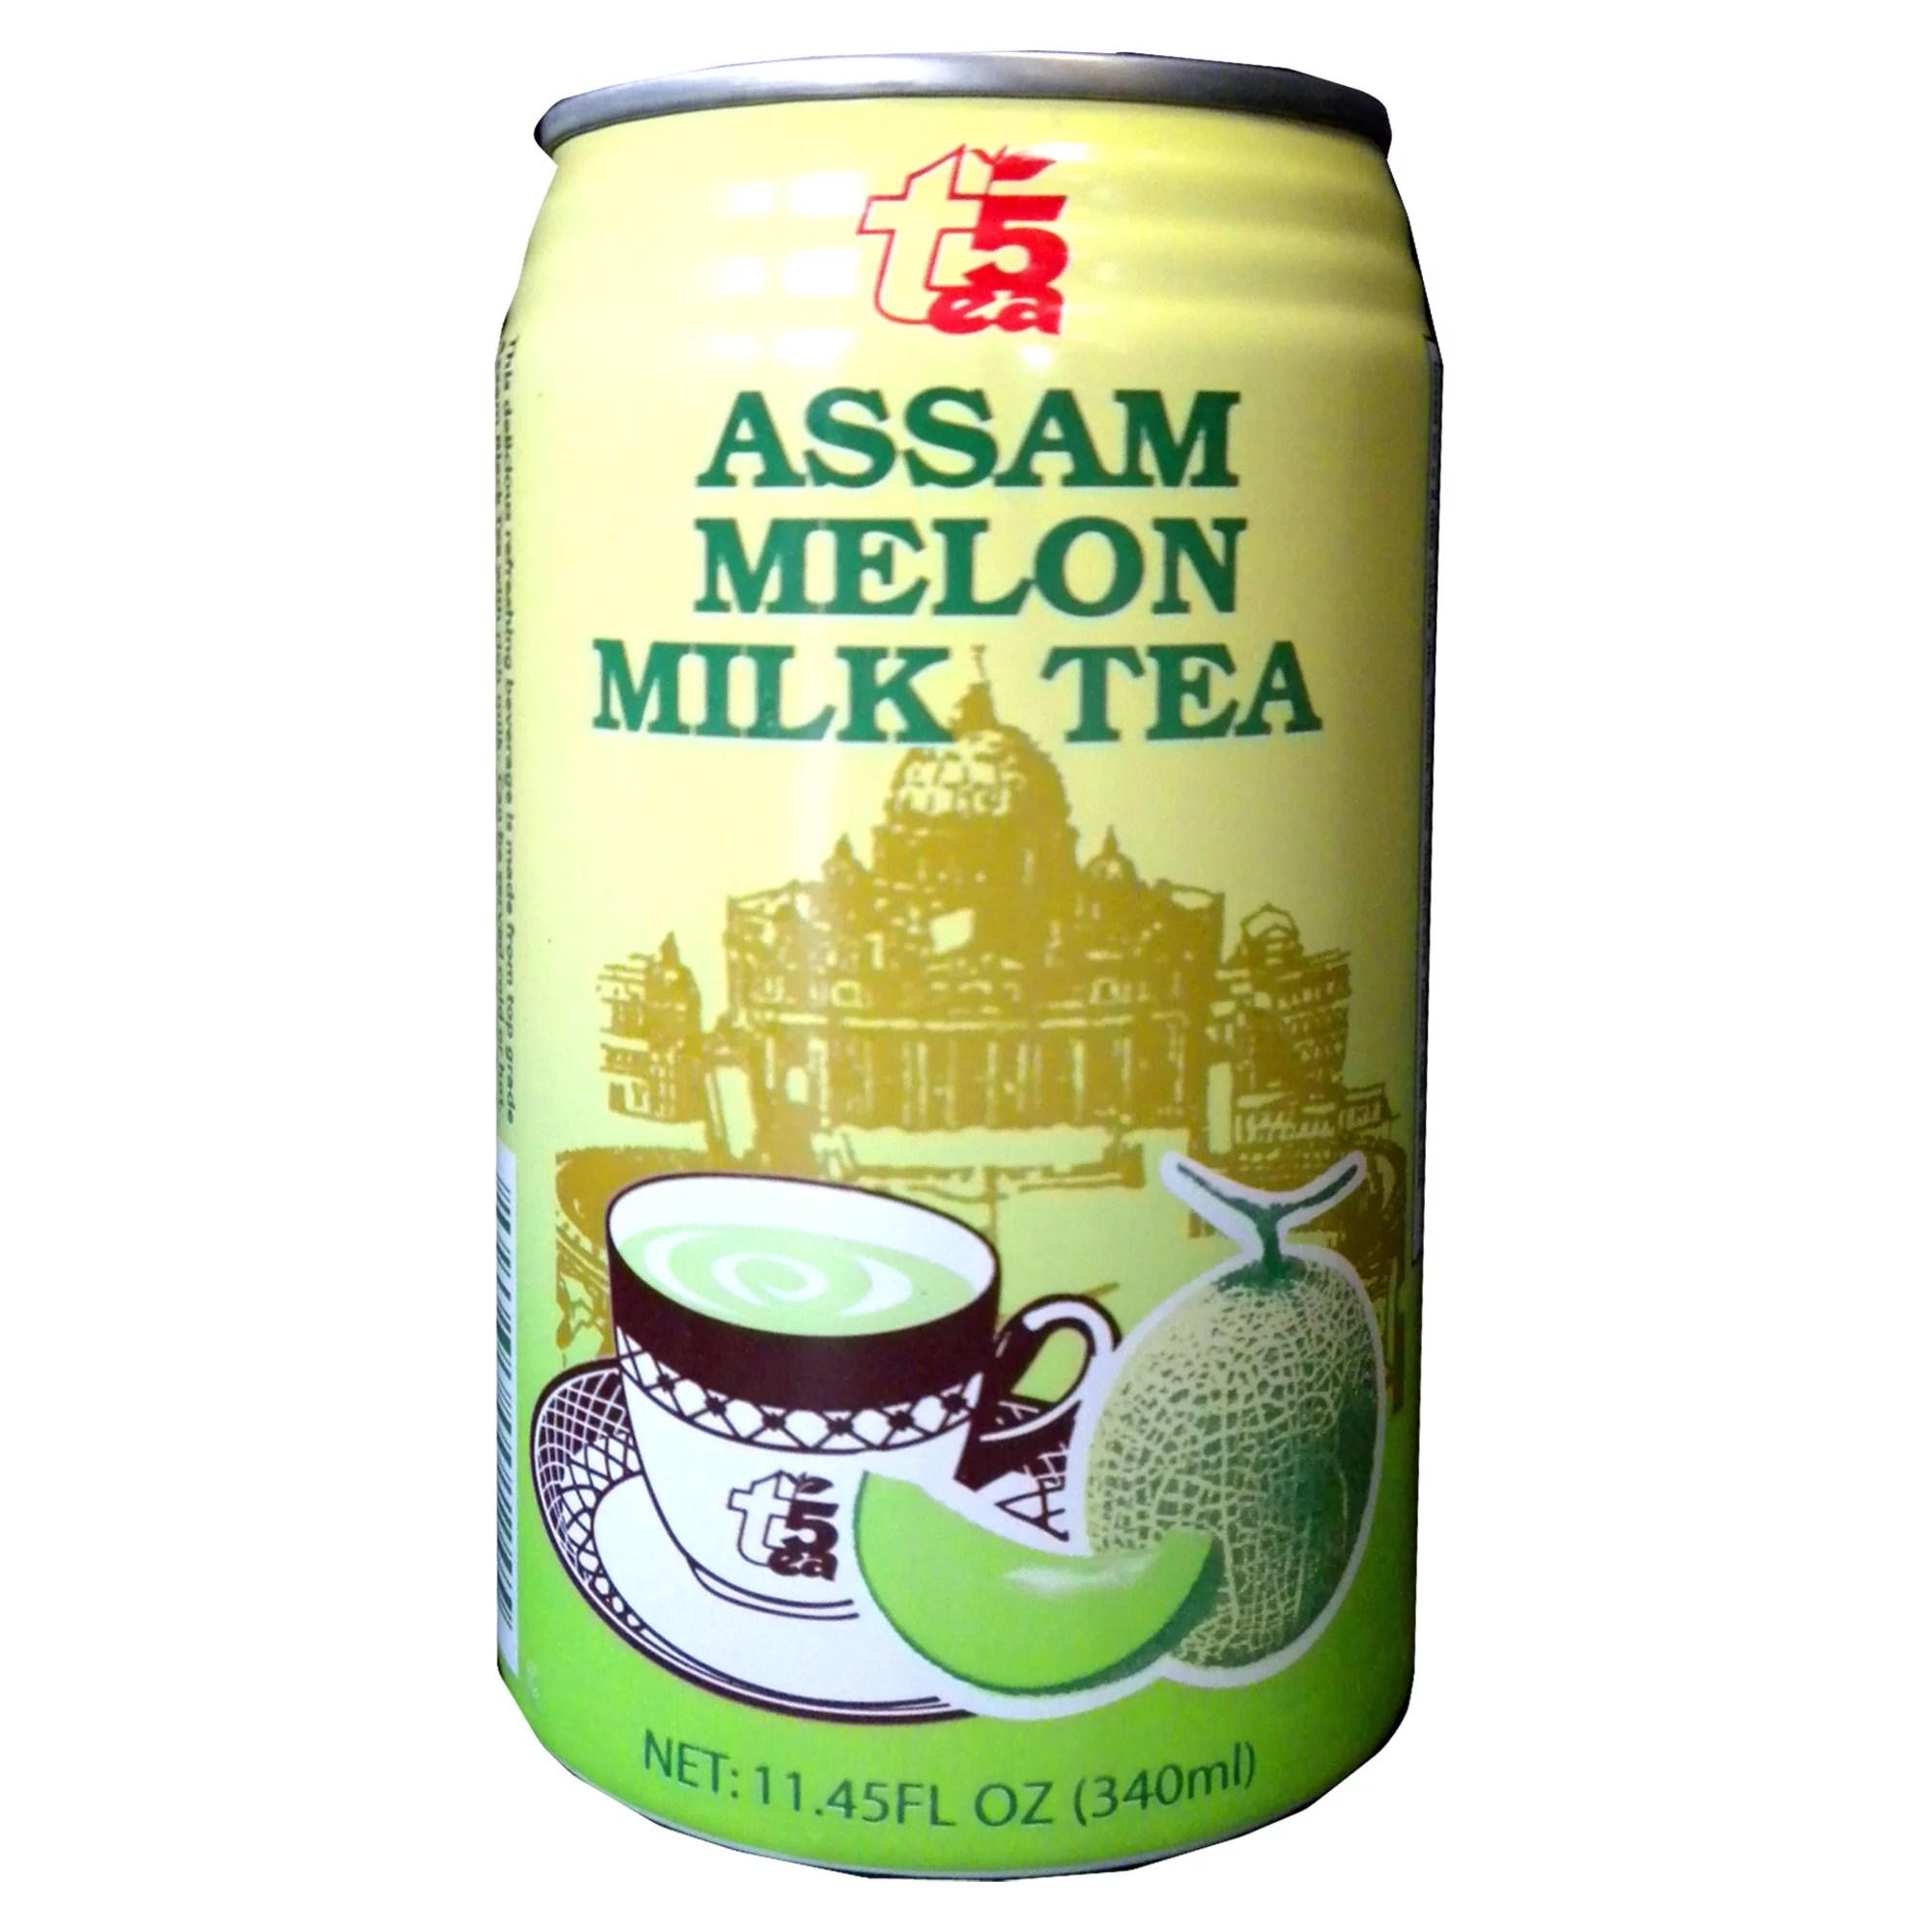 Tea 5 Assam Melon Milk Tea 11.45floz - Walmart.com ...